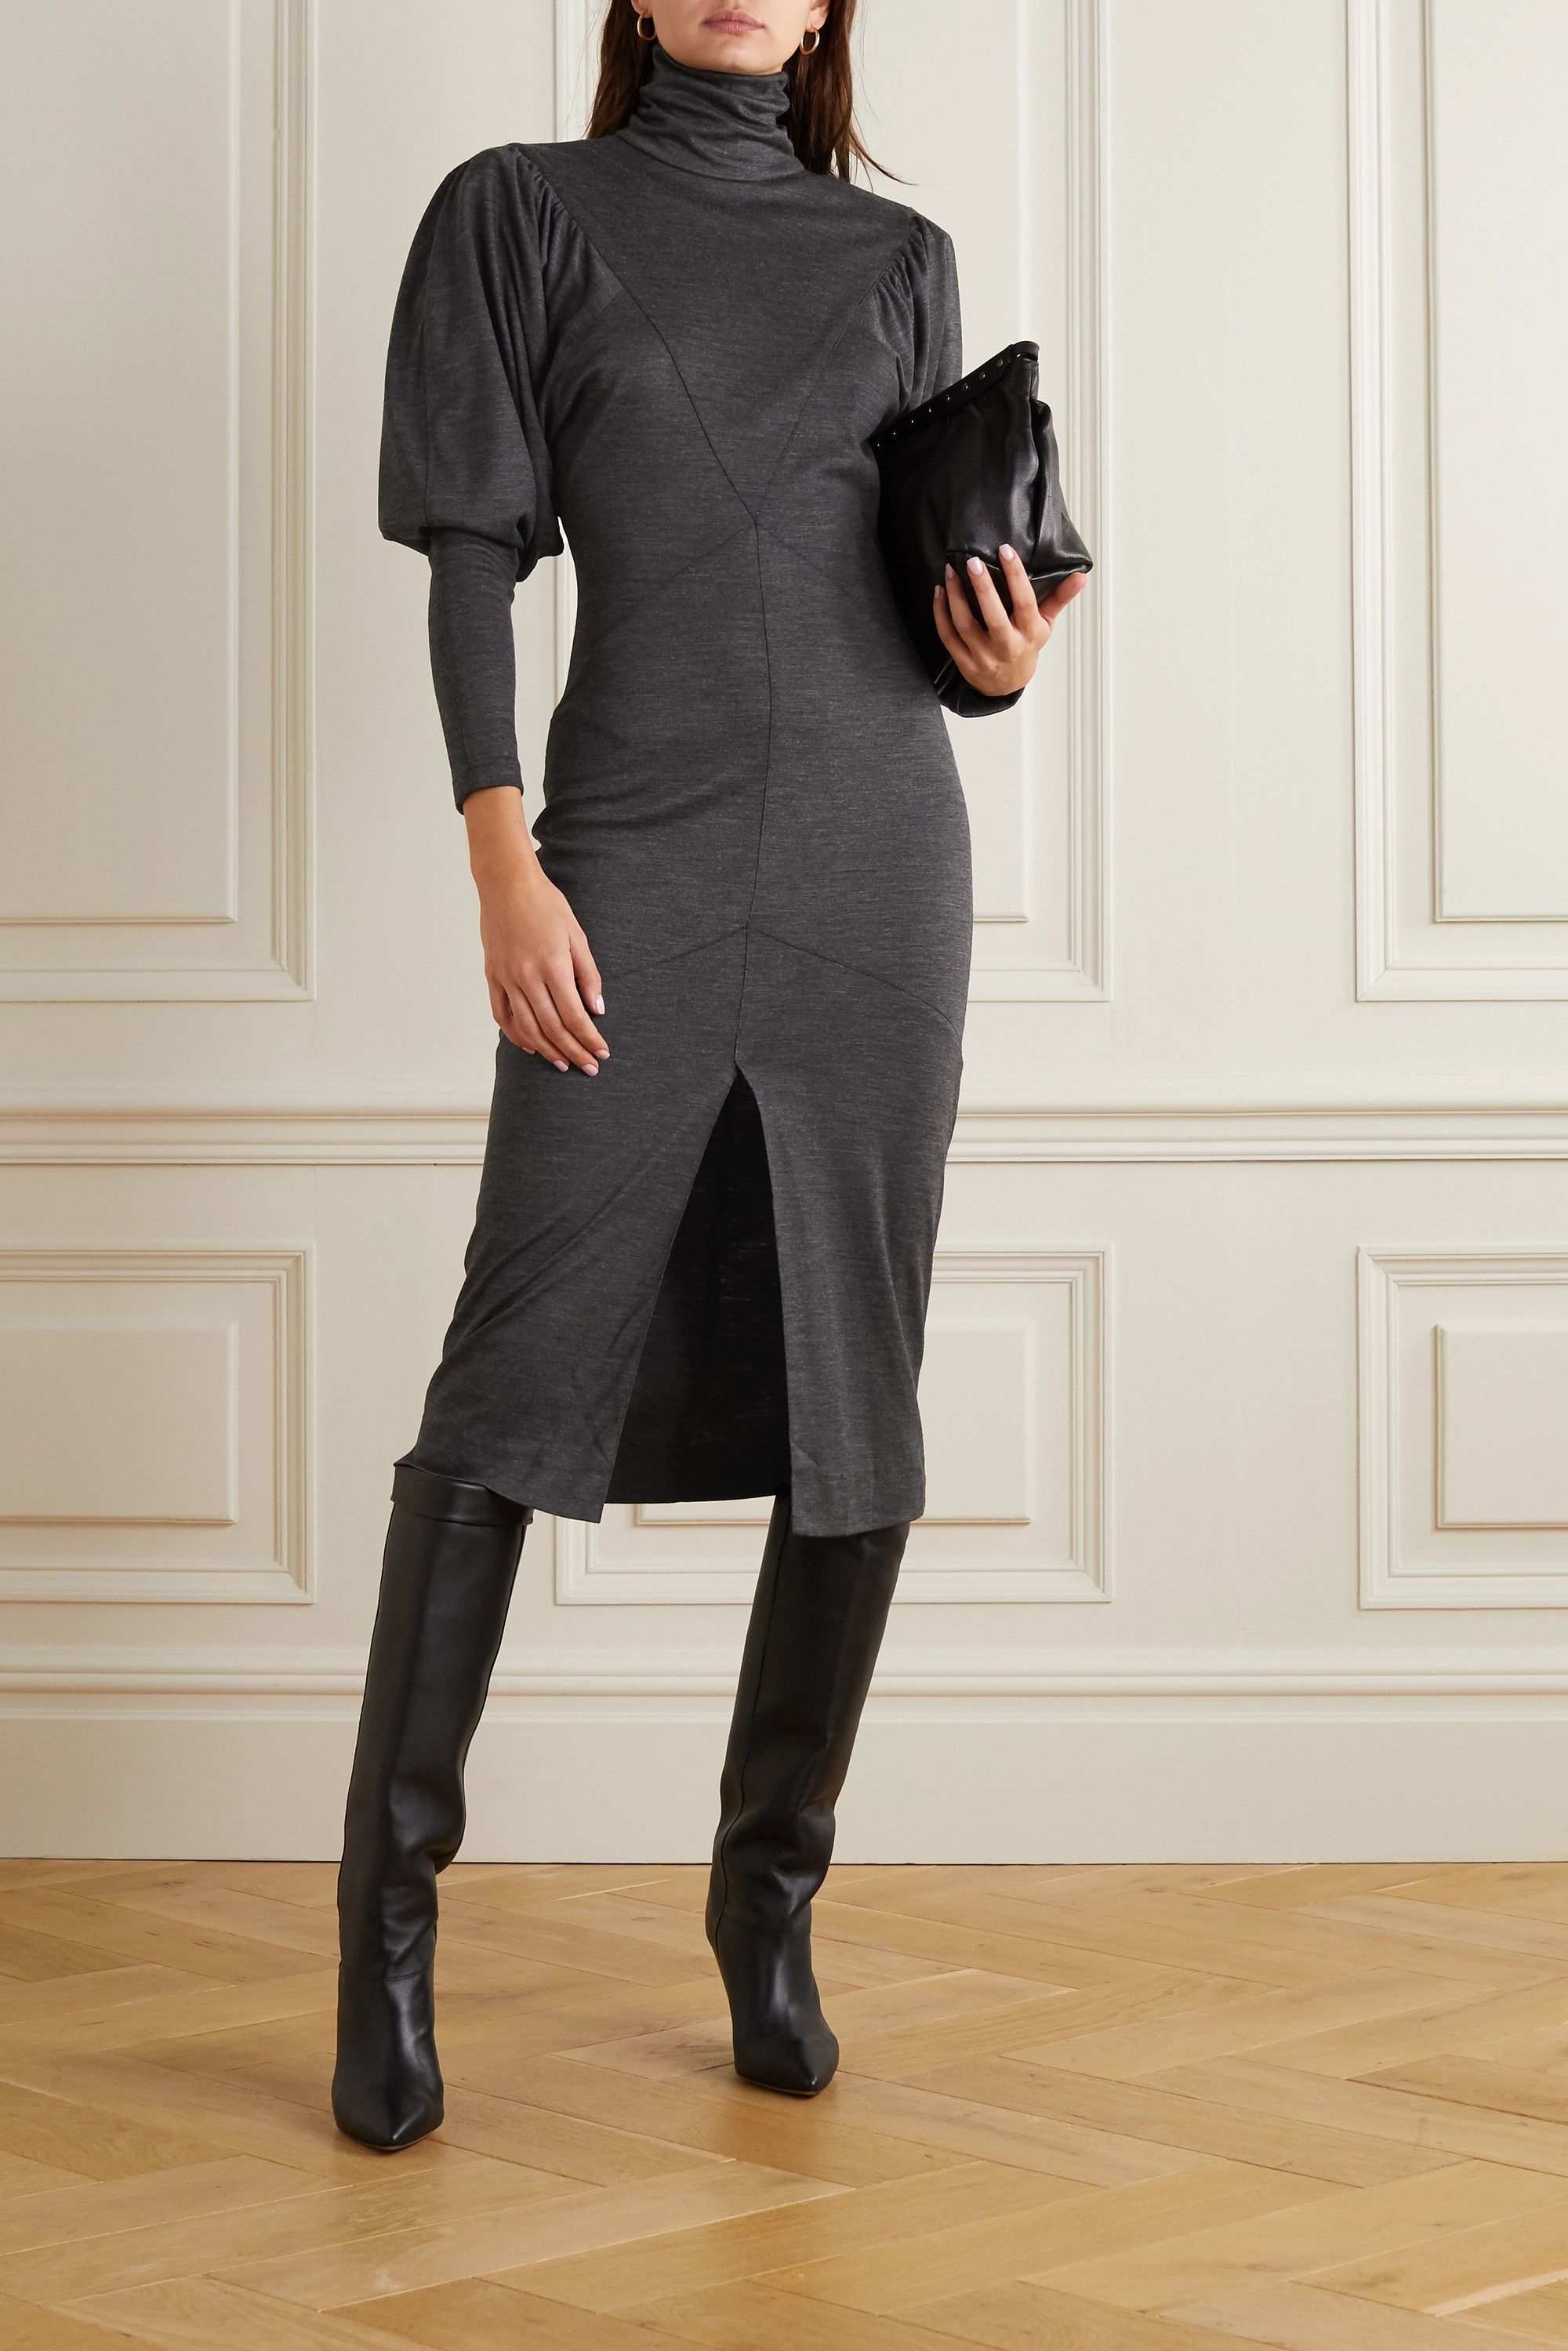 Isabel Marant Genia paneled mélange wool turtleneck midi dress